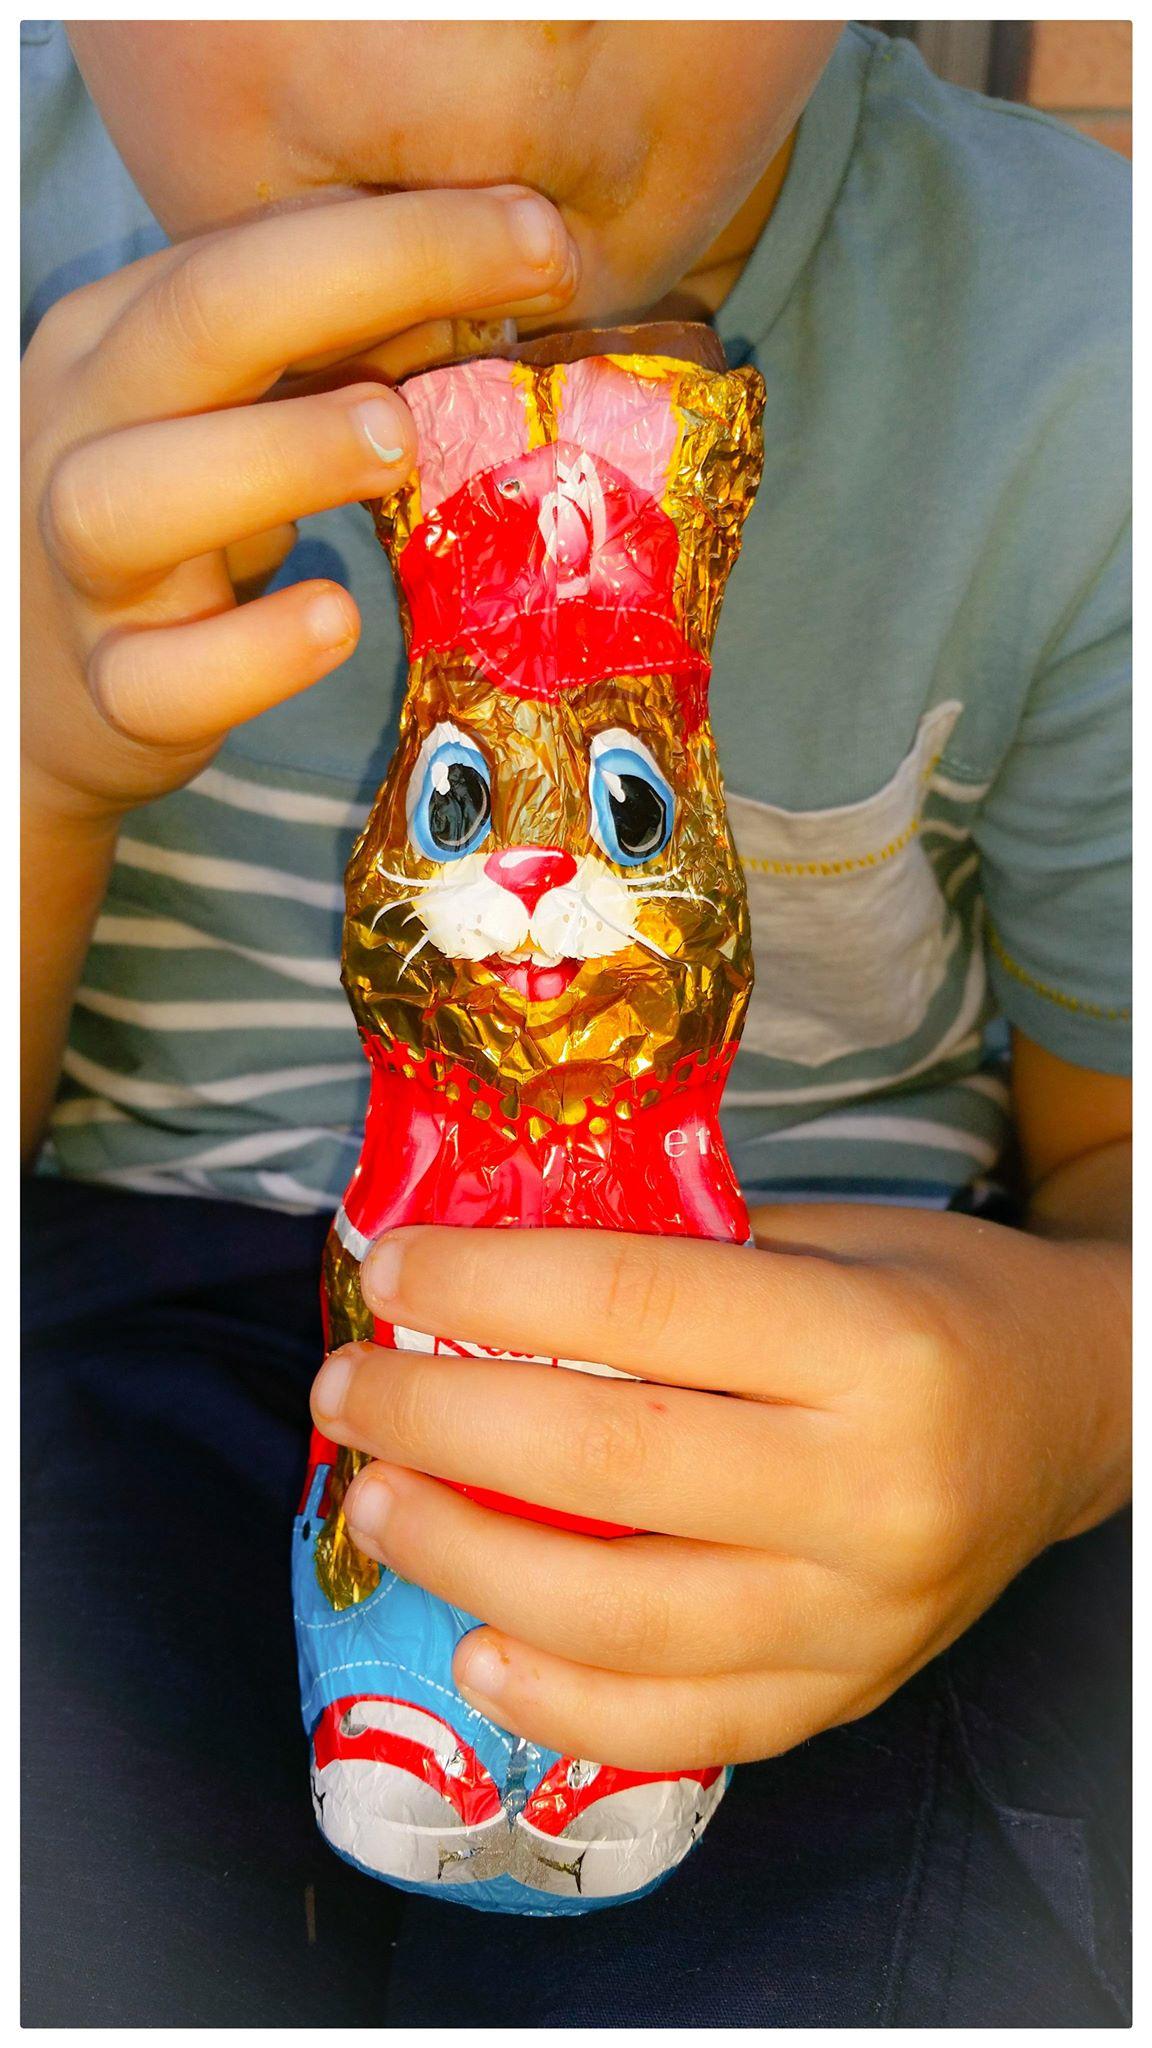 Easter choc bunny 2